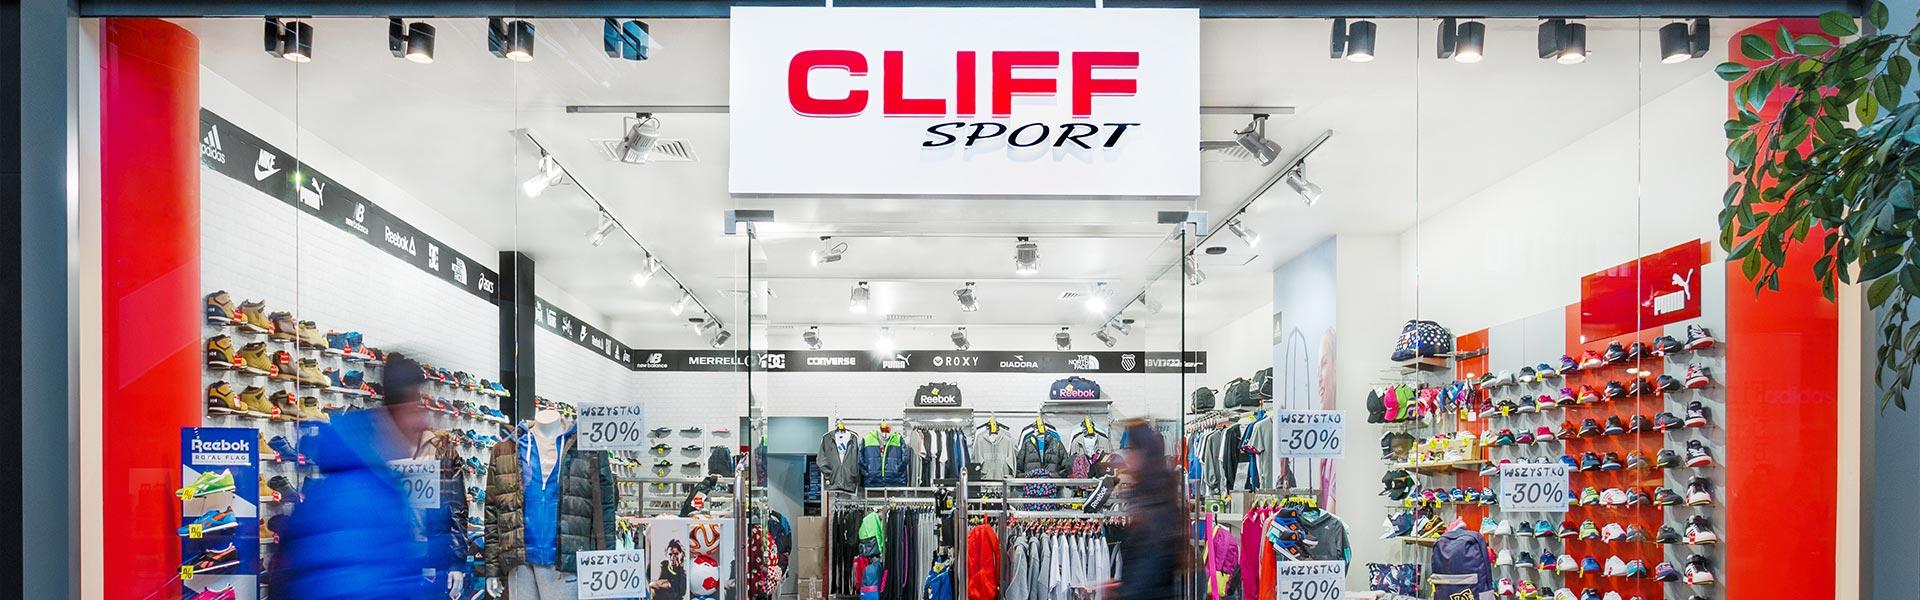 sklep cliff sport w galerii